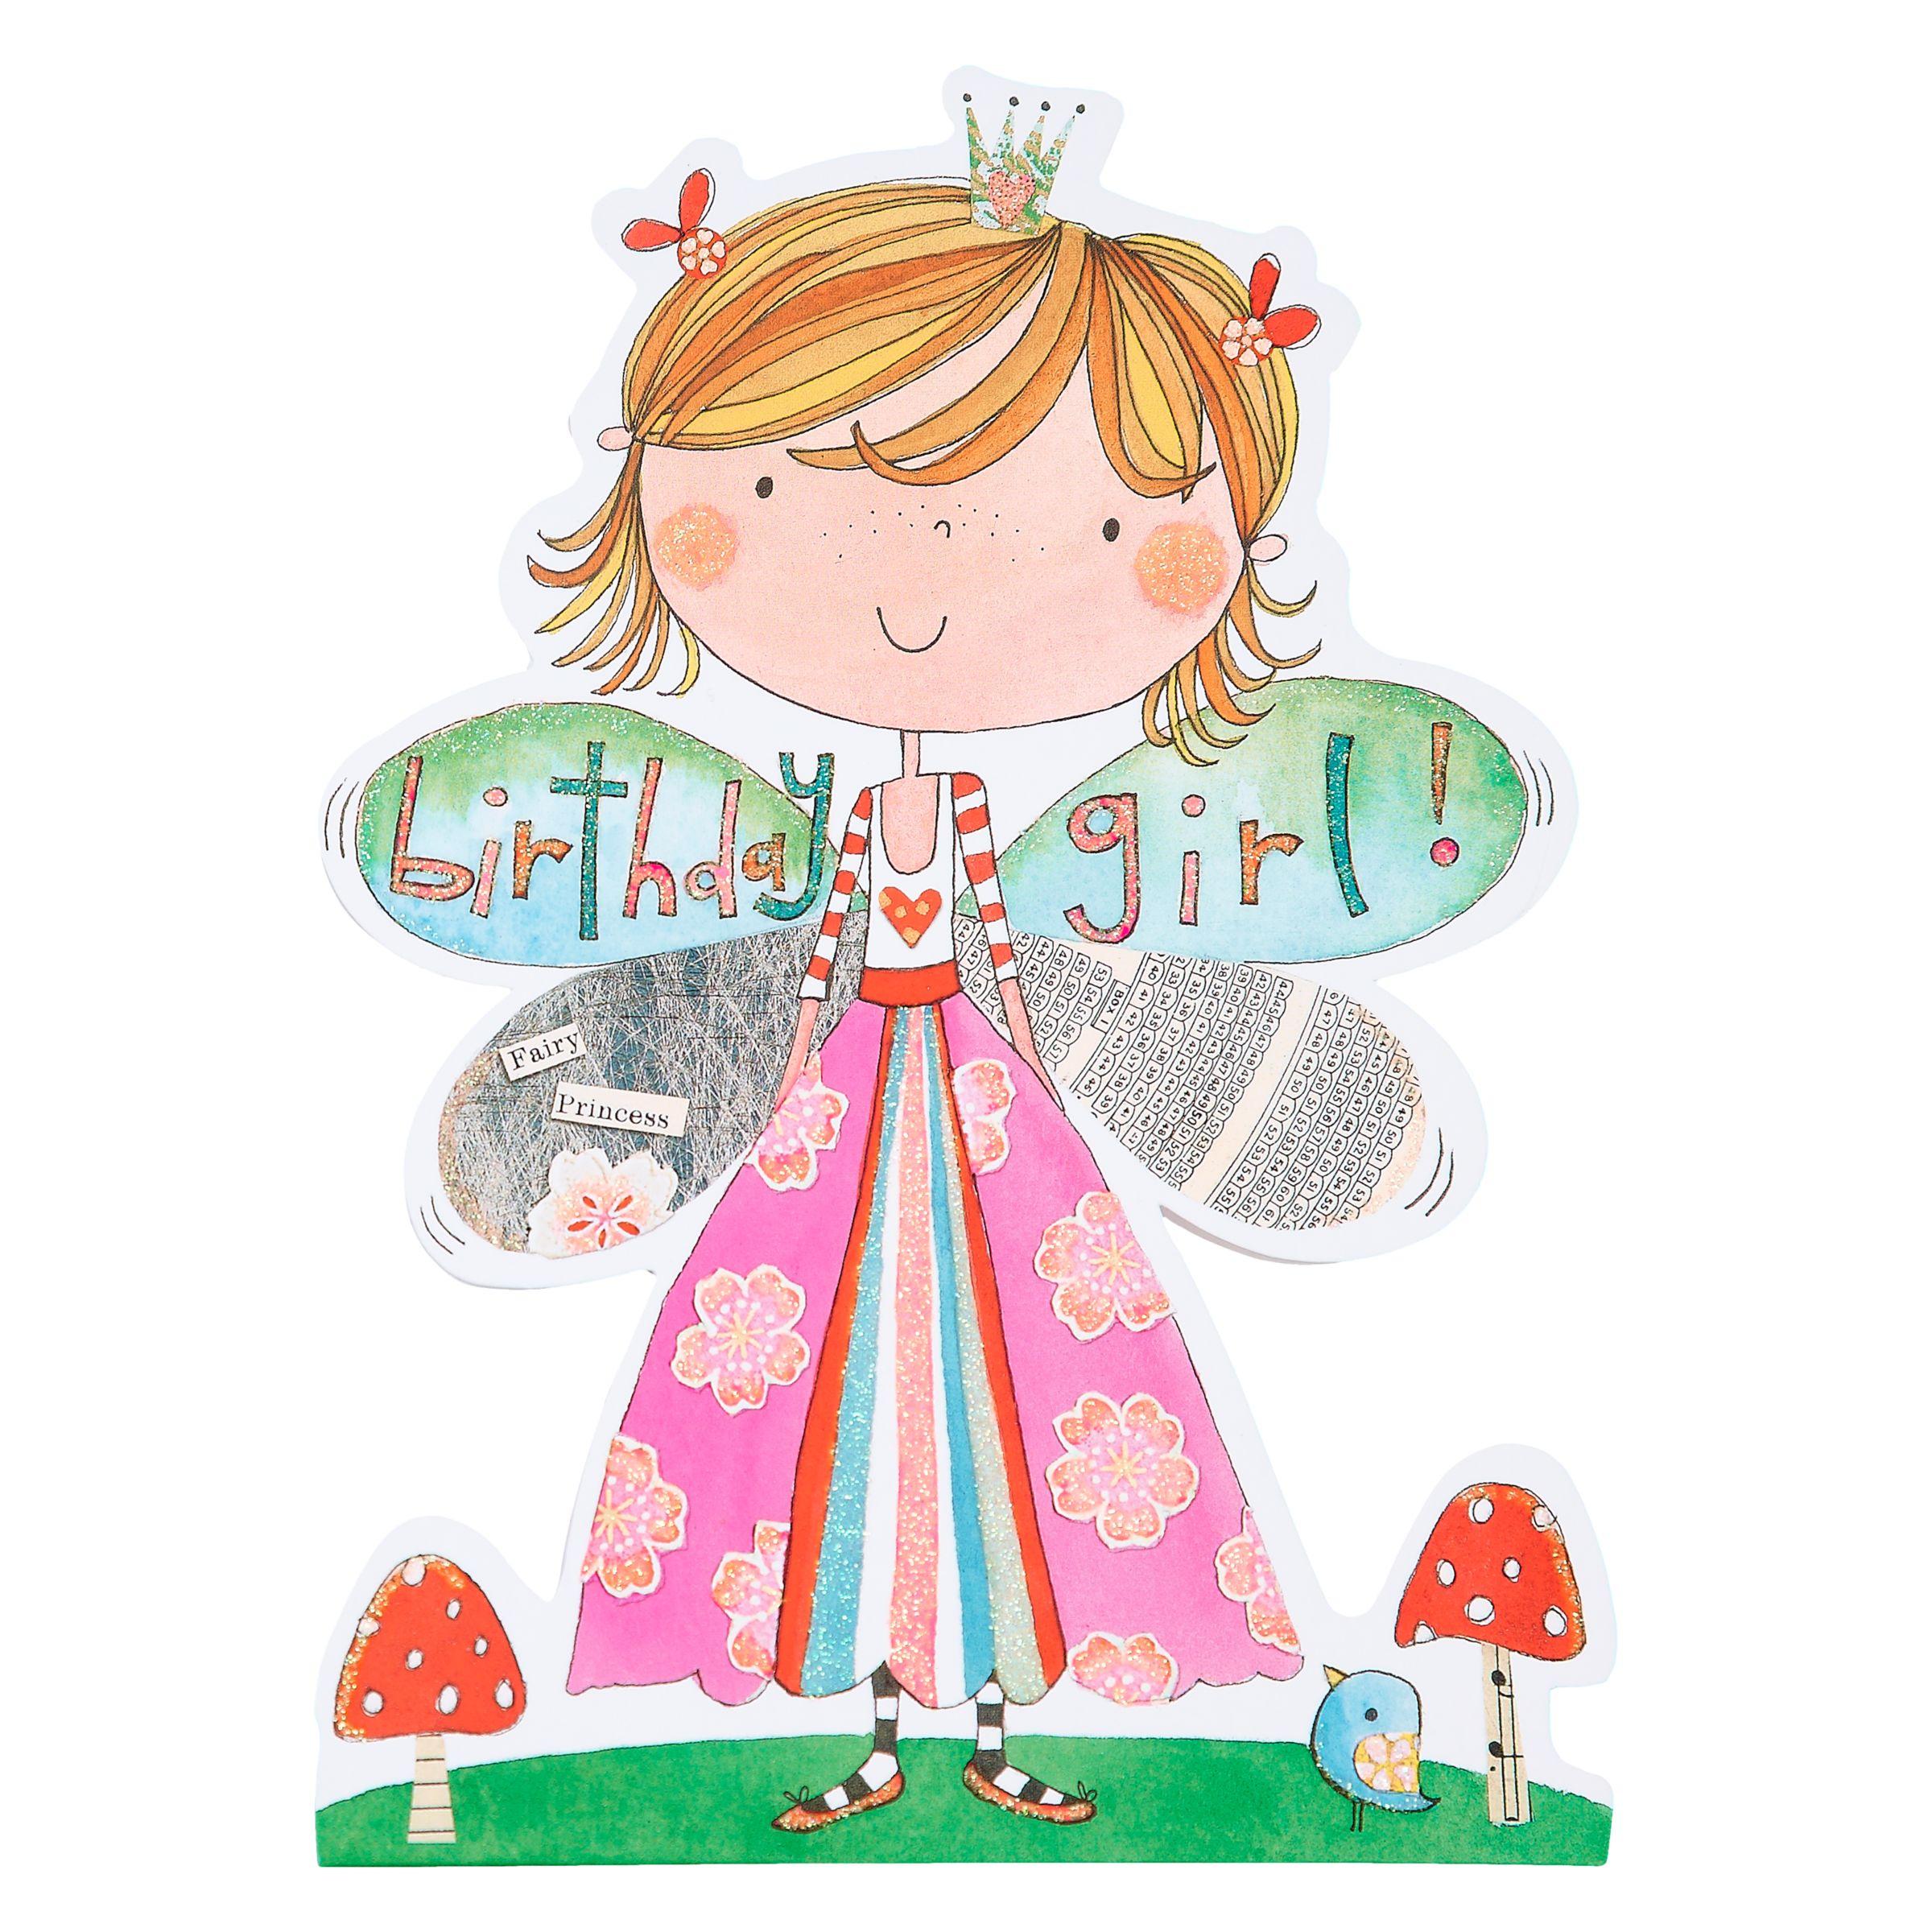 Birthday Cards For Kids Birthday Cards for Children